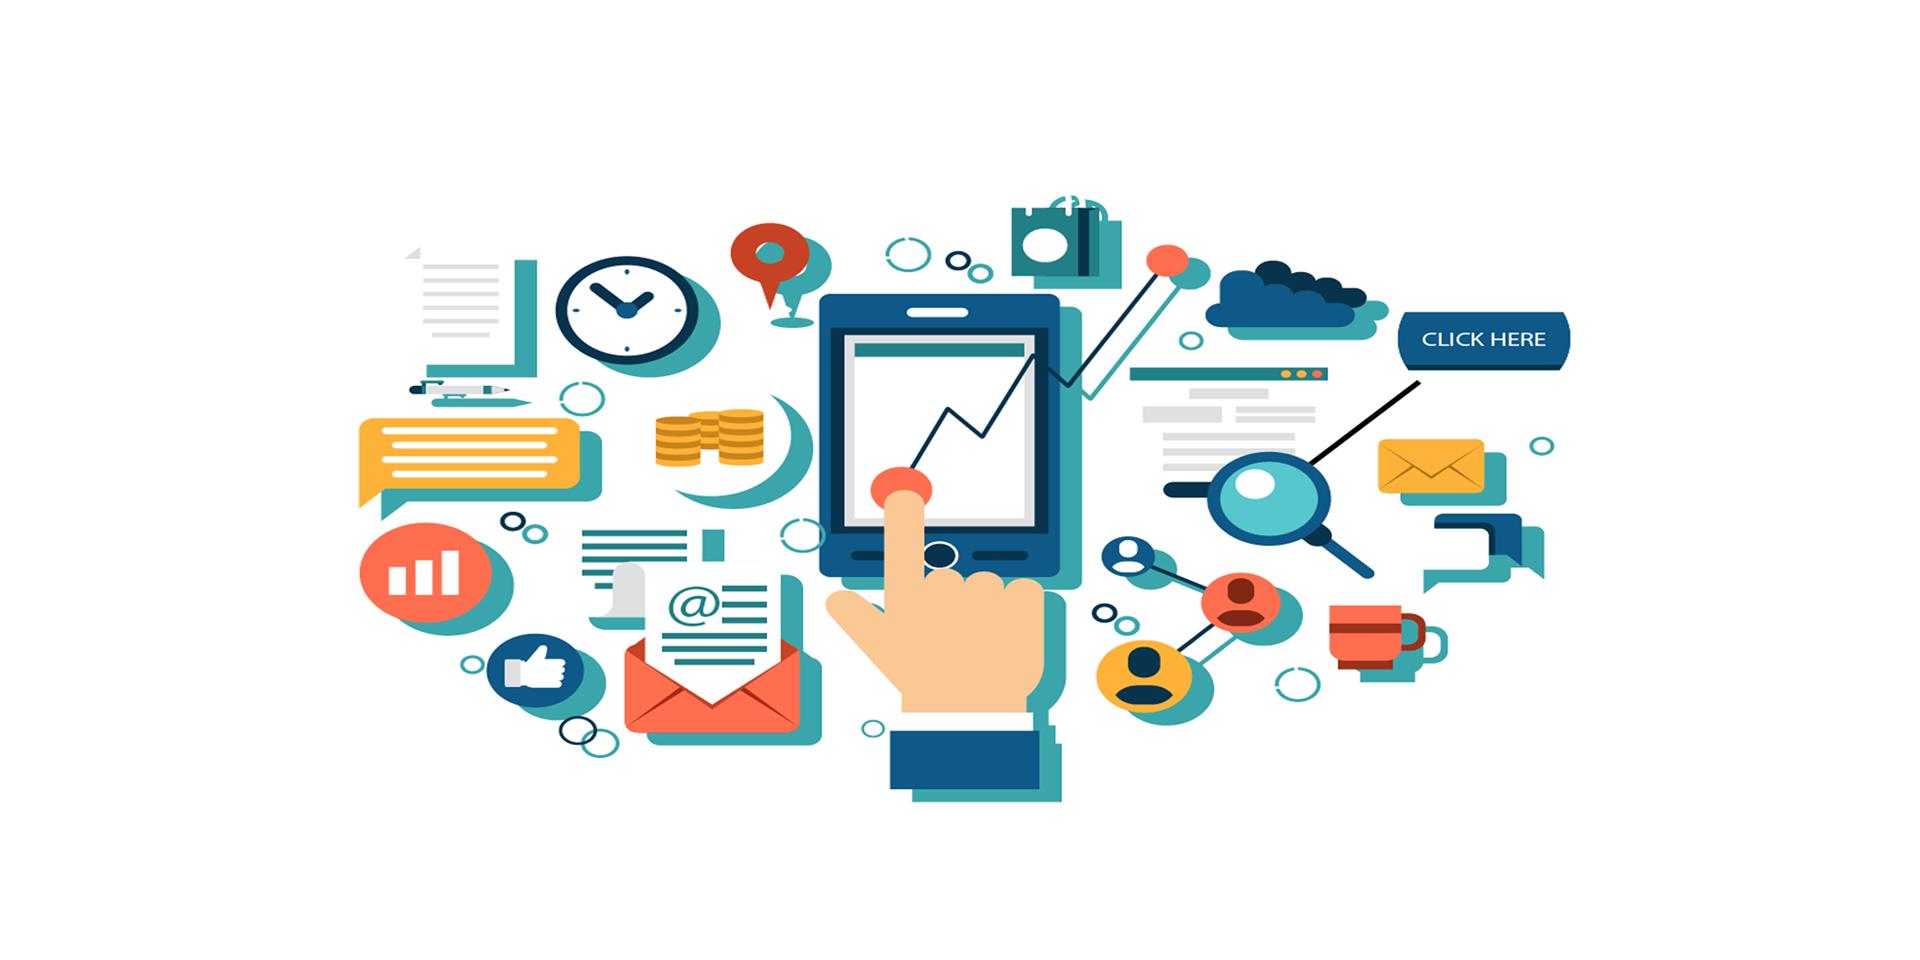 gestionar datos para empresas